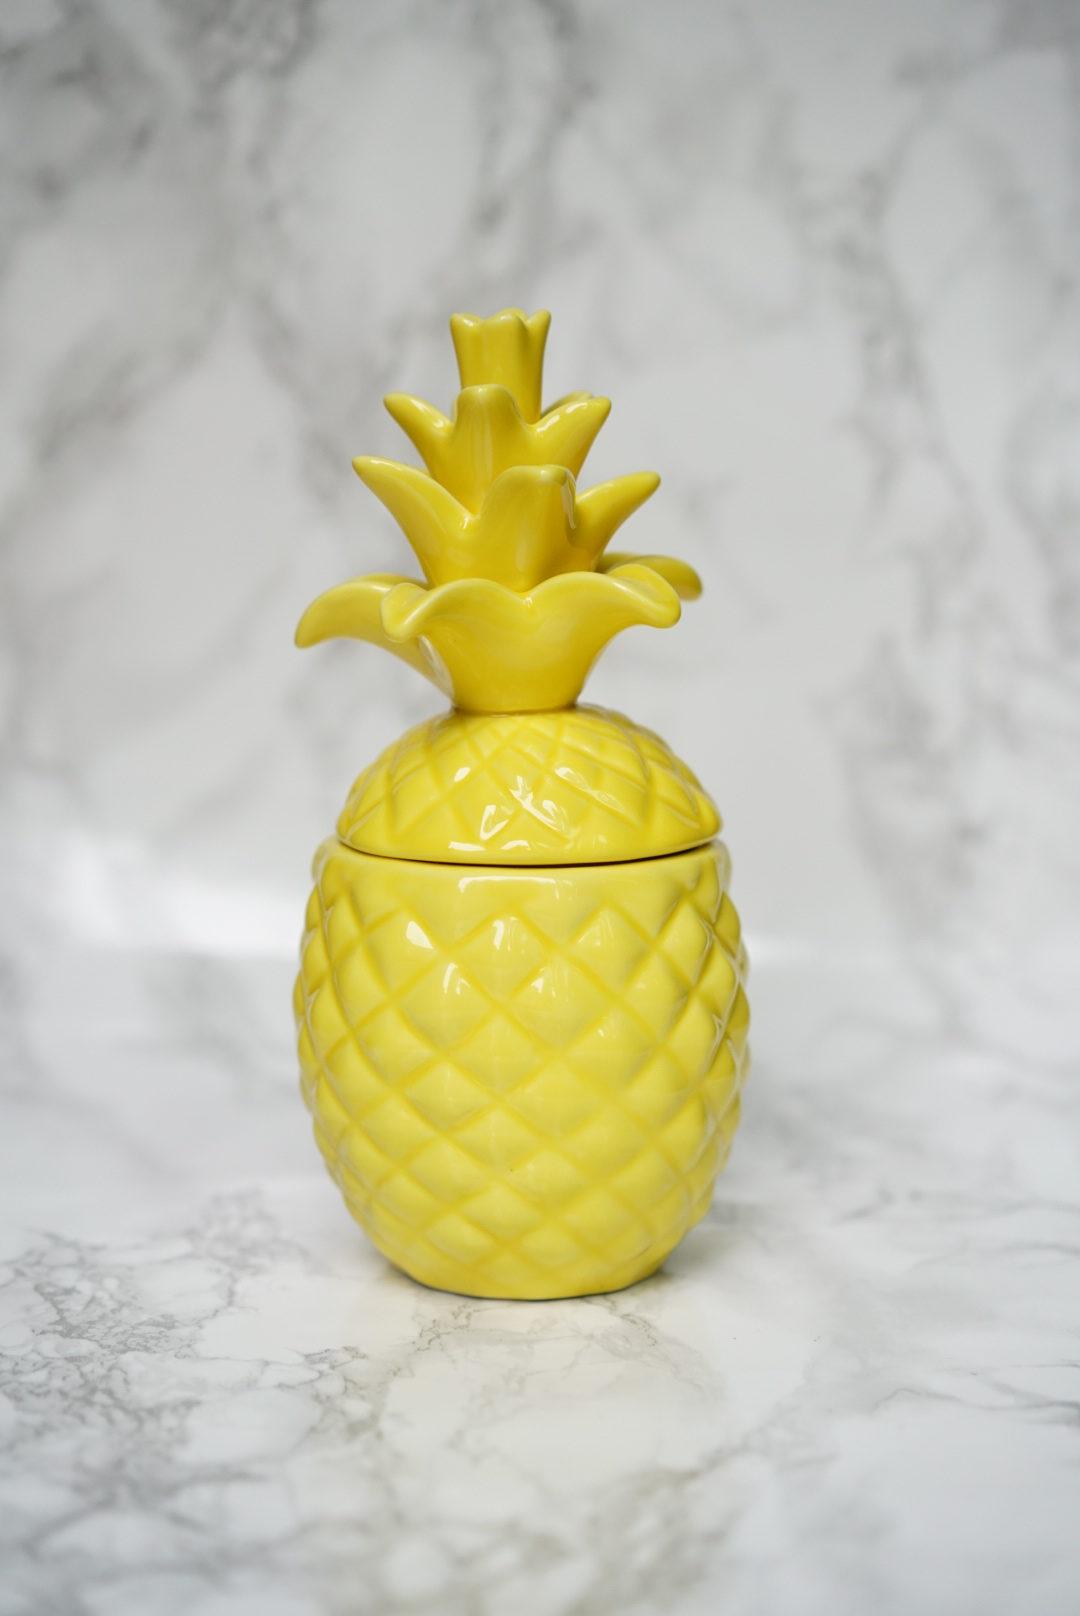 Target Pineapple Candle Angela Lanter Hello Gorgeous